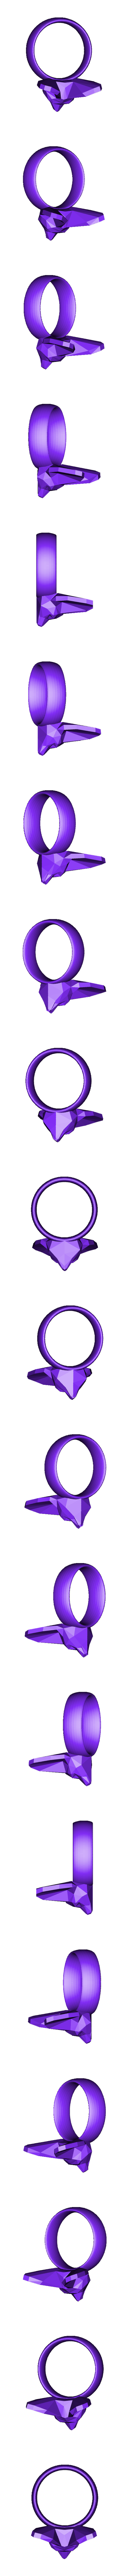 fennec_fox_ring_v2.stl Télécharger fichier STL gratuit Bague Renard Fennec • Objet à imprimer en 3D, AlbertKhan3D